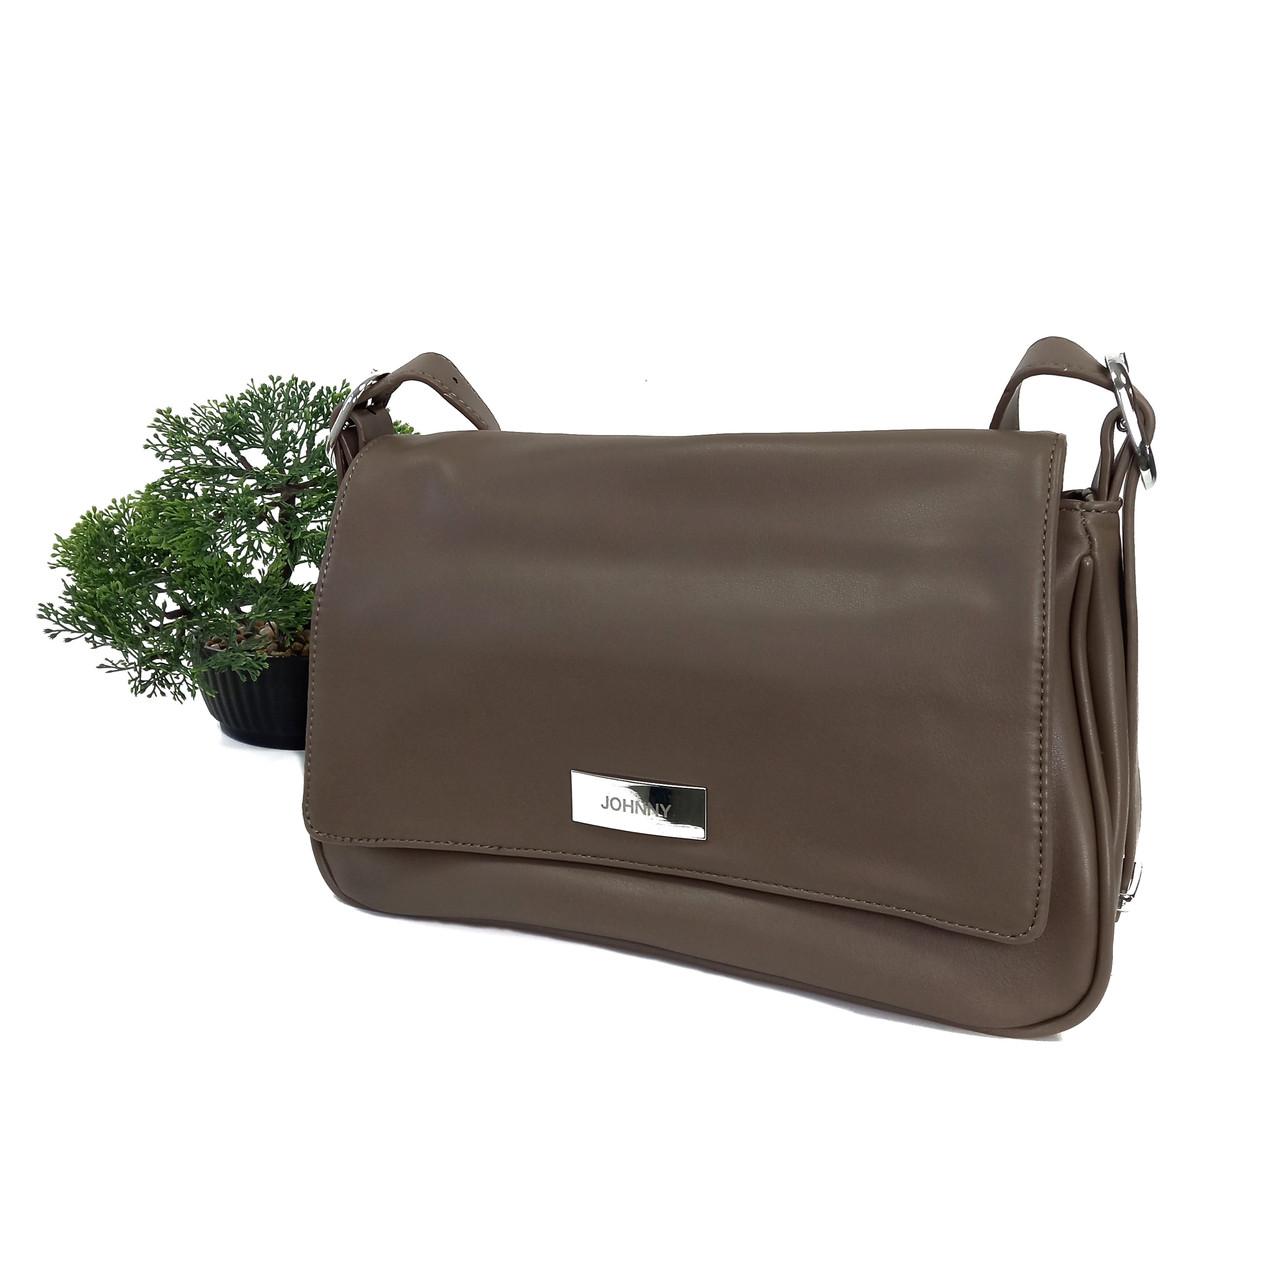 Жіноча стильна сумка-клатч кави з молоком Арт.SJ-2085 mud Johnny (Китай)